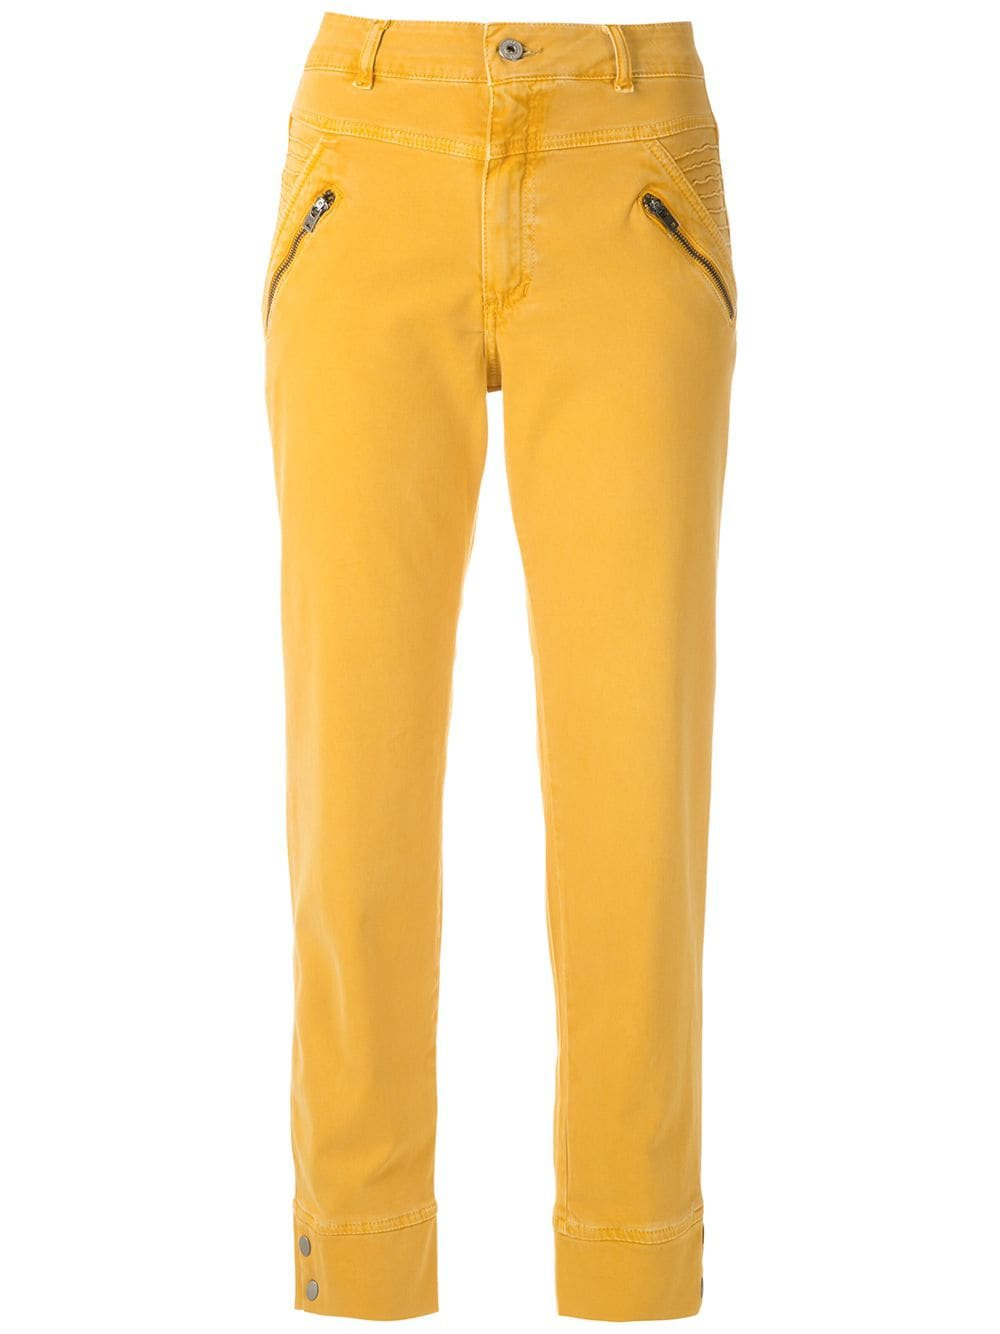 Mara Mac Zipped Straight Trousers